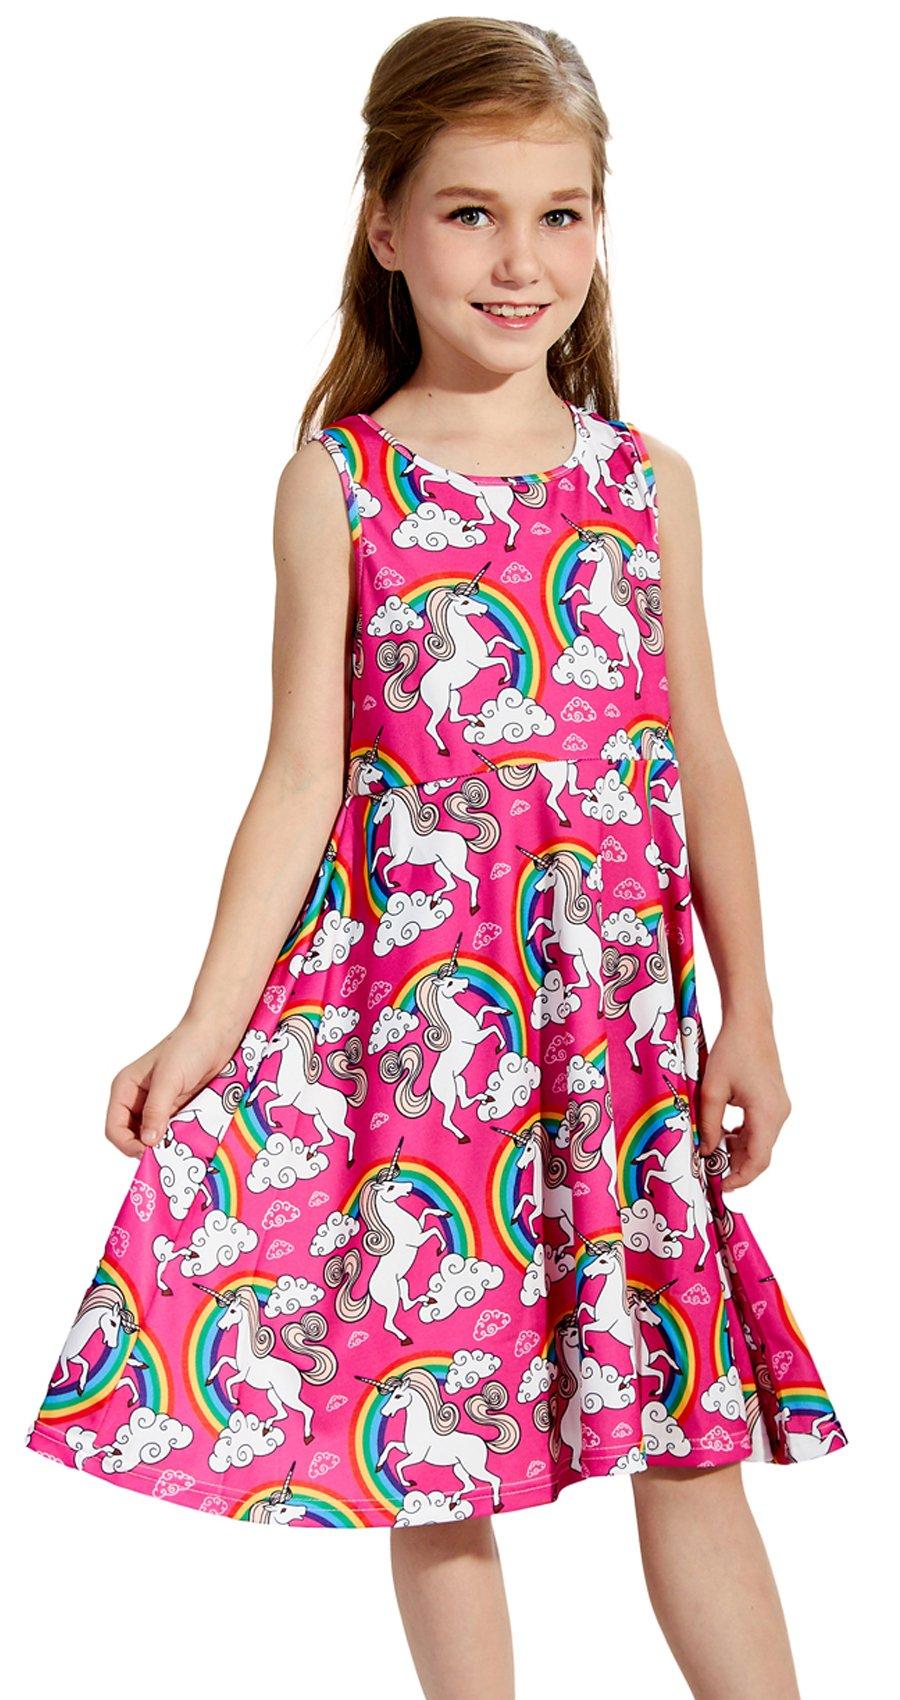 ALOOCA Girls Sleeveless Dress Round Neck Floral Printed Cartoon Dress Casual Holiday Party Sundress 4-13 Years